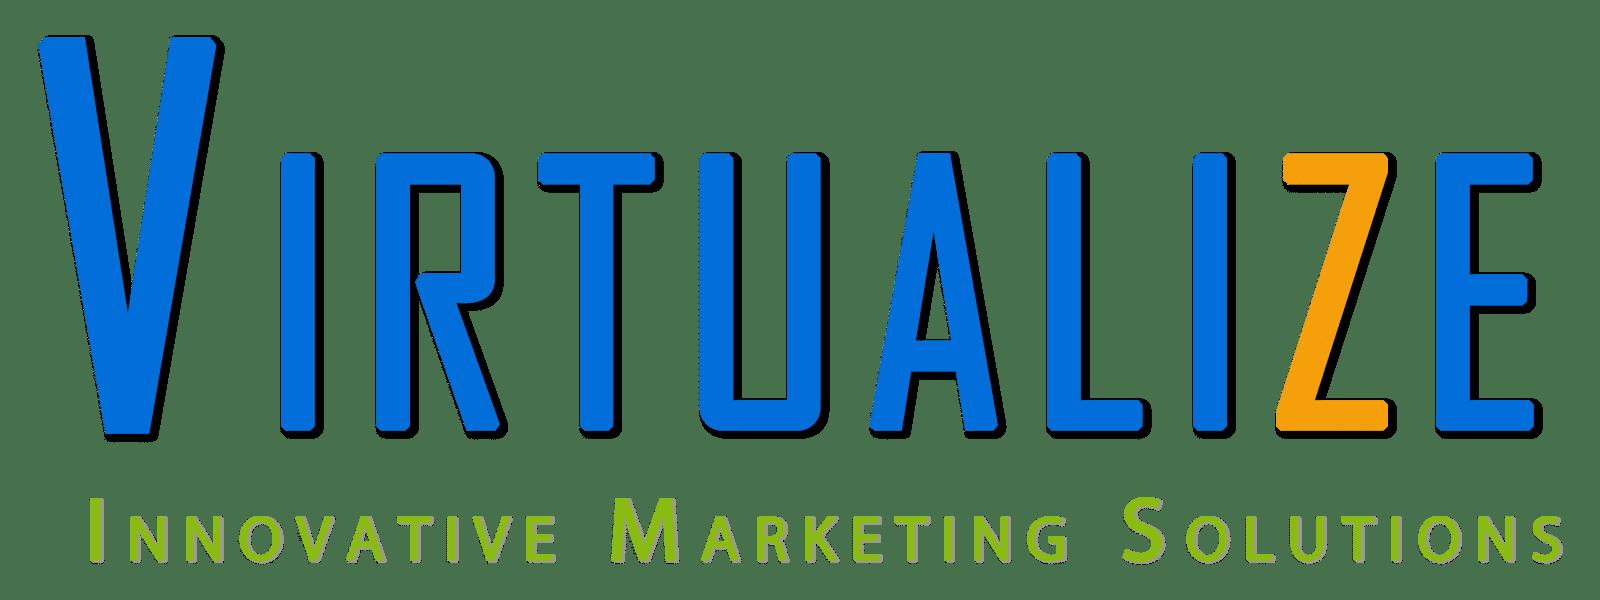 VIRTUALIZE - Innovative Marketing Solutions (Brisbane)